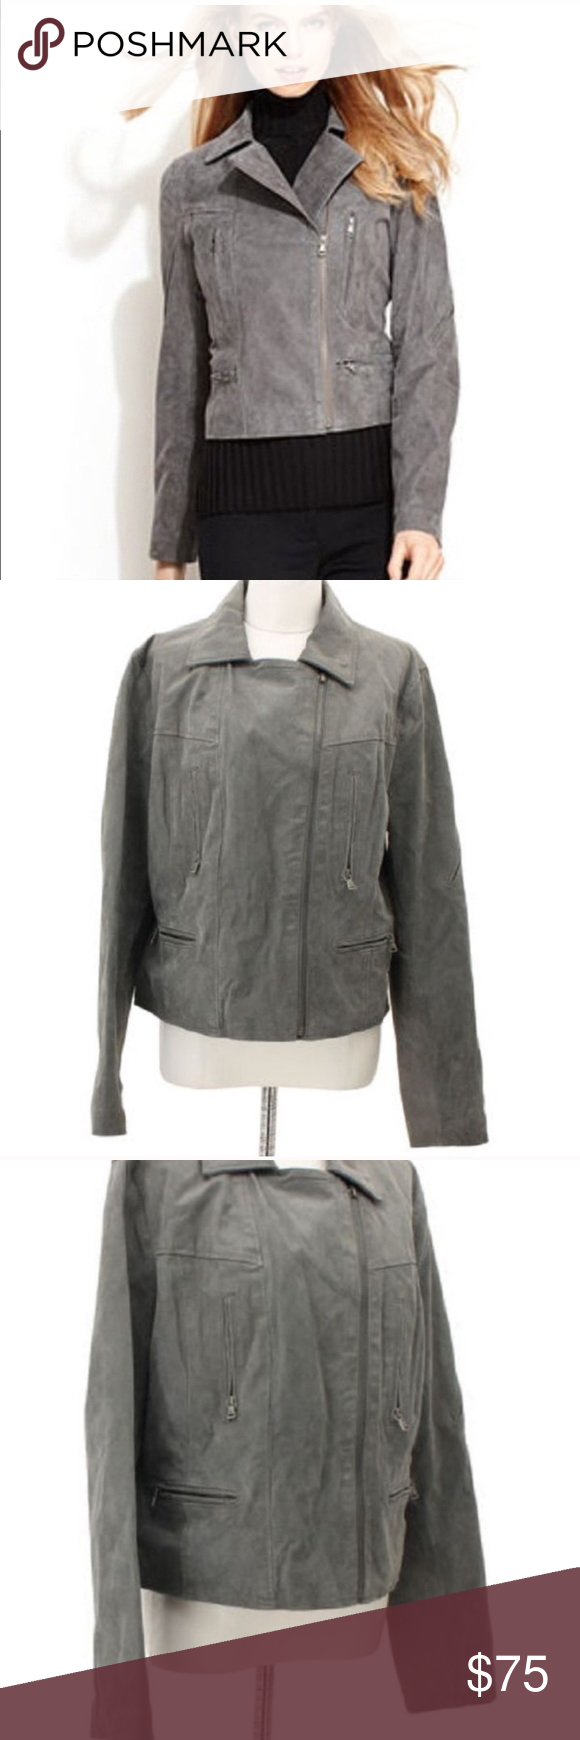 LEVI'S gray genuine leather suede moto jacket Suede